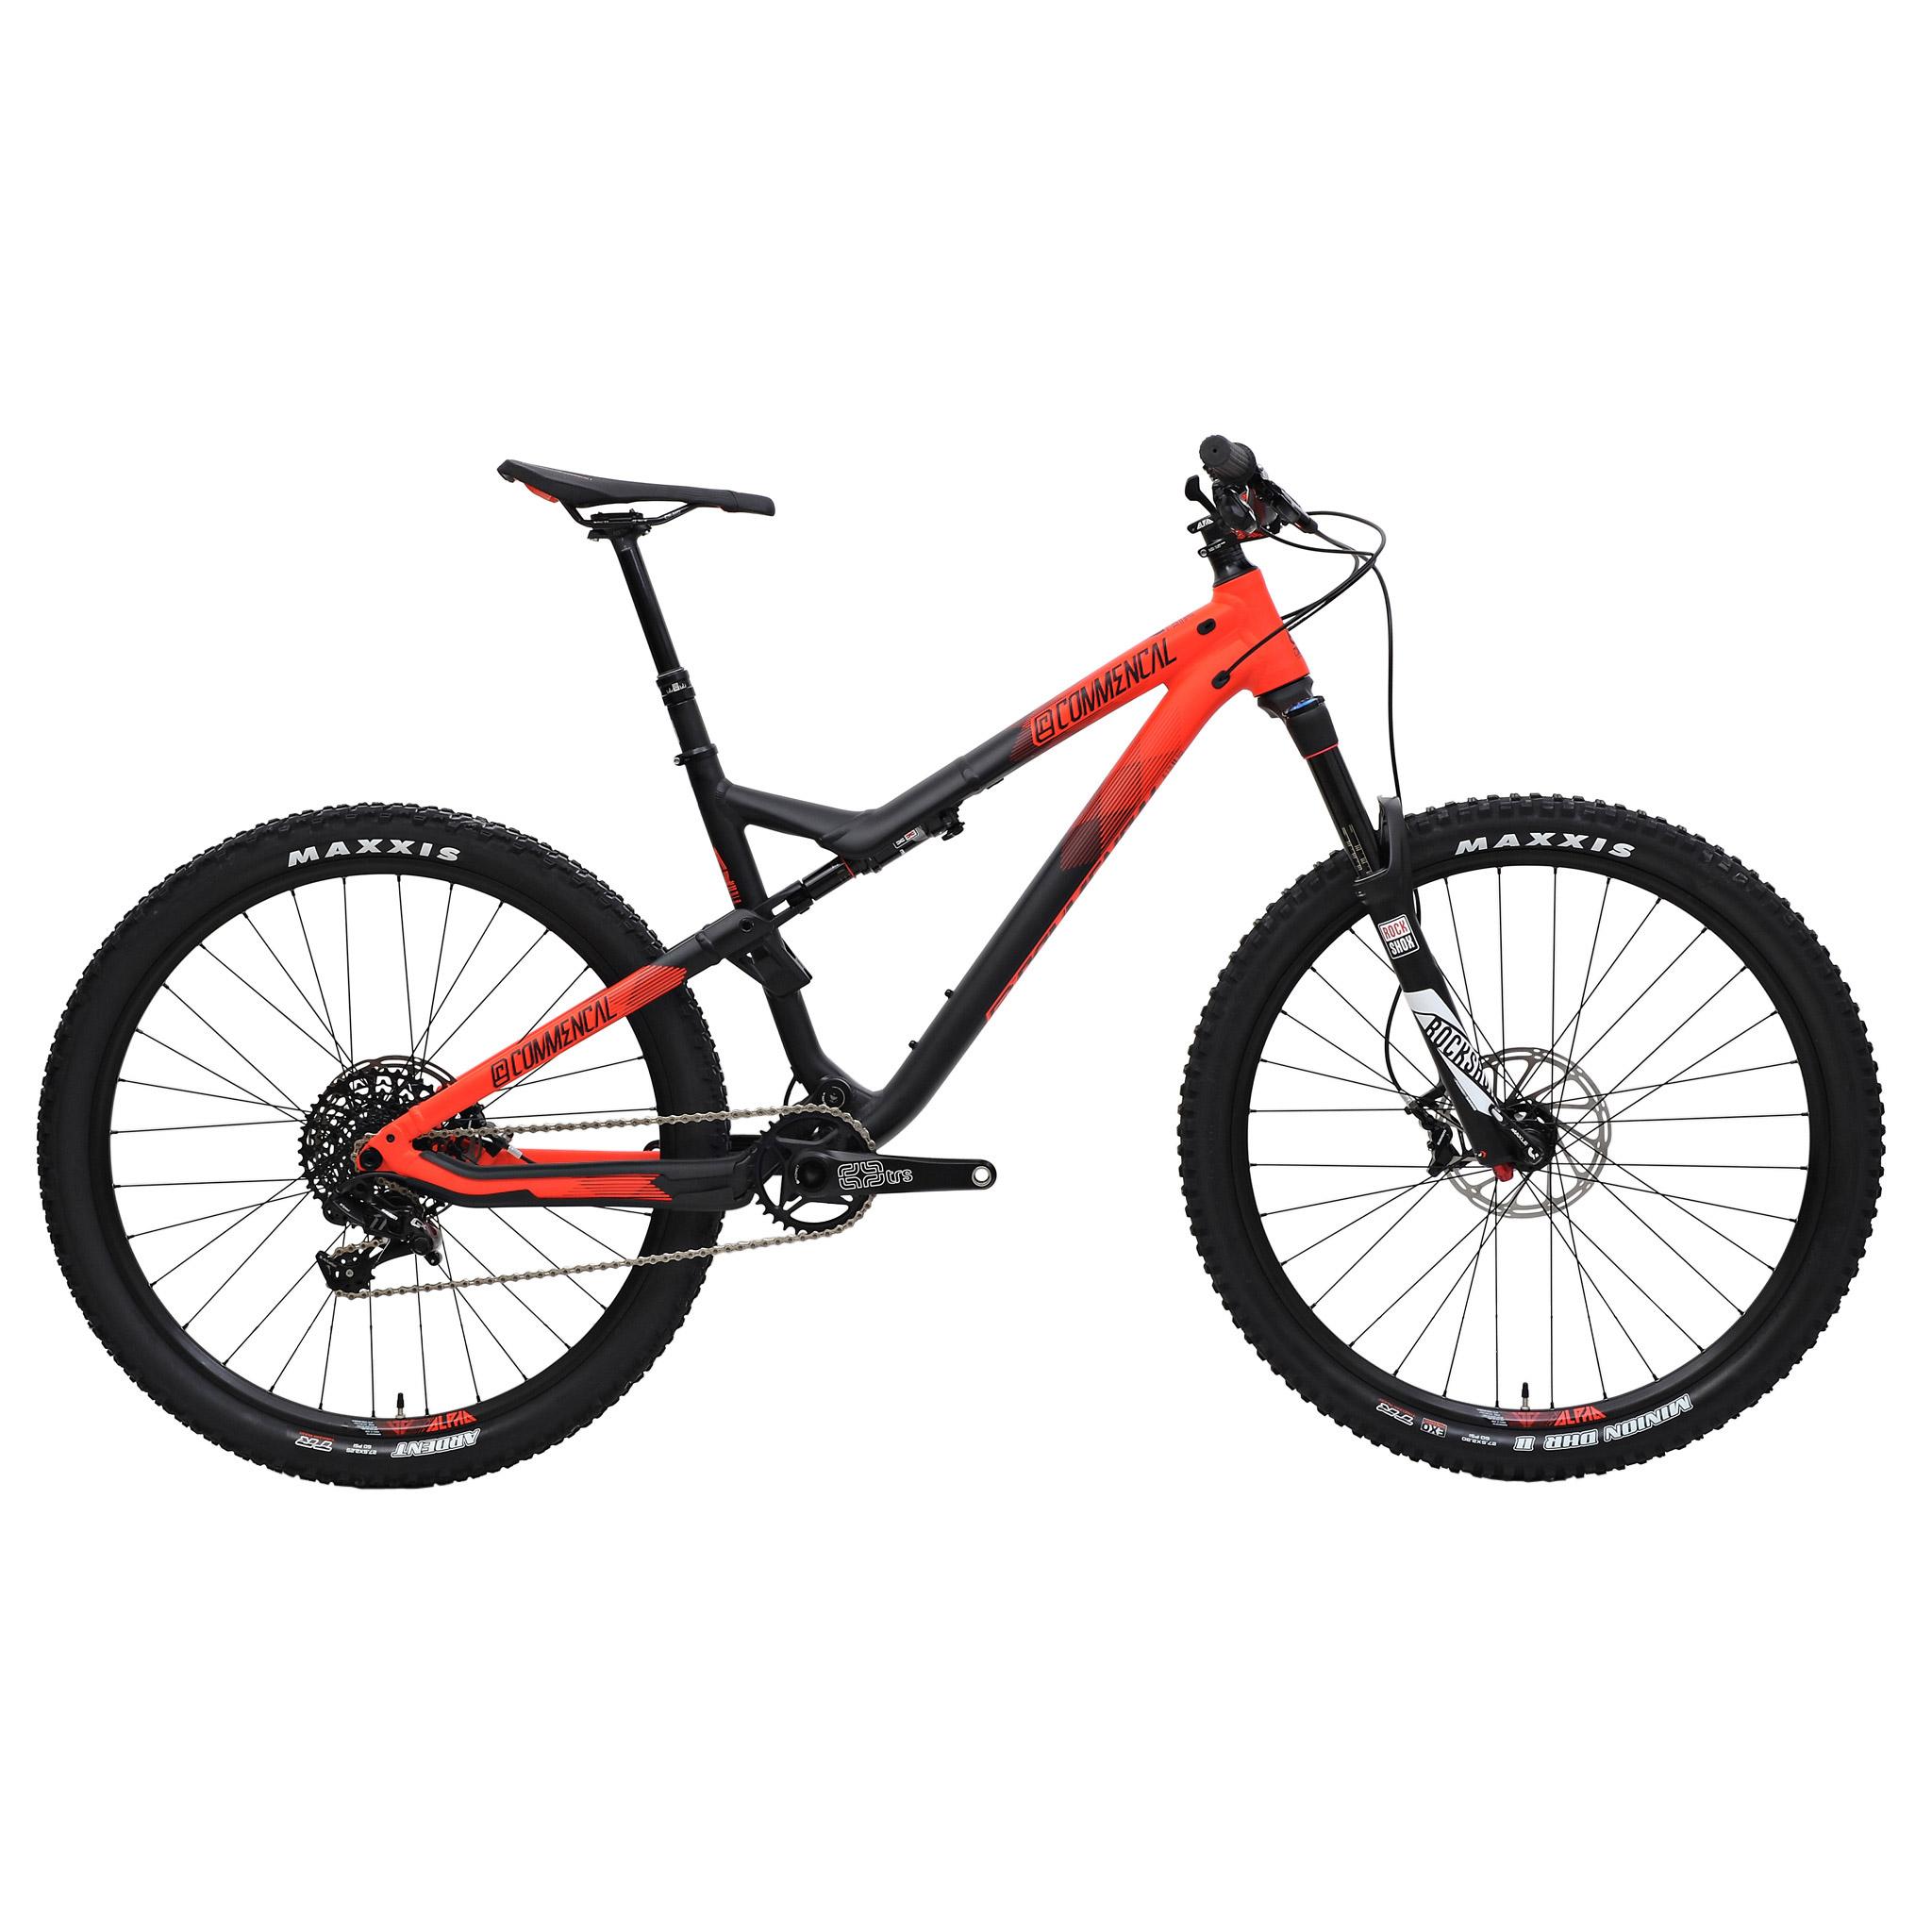 Commençal bikes 115050-pb148533-1-main